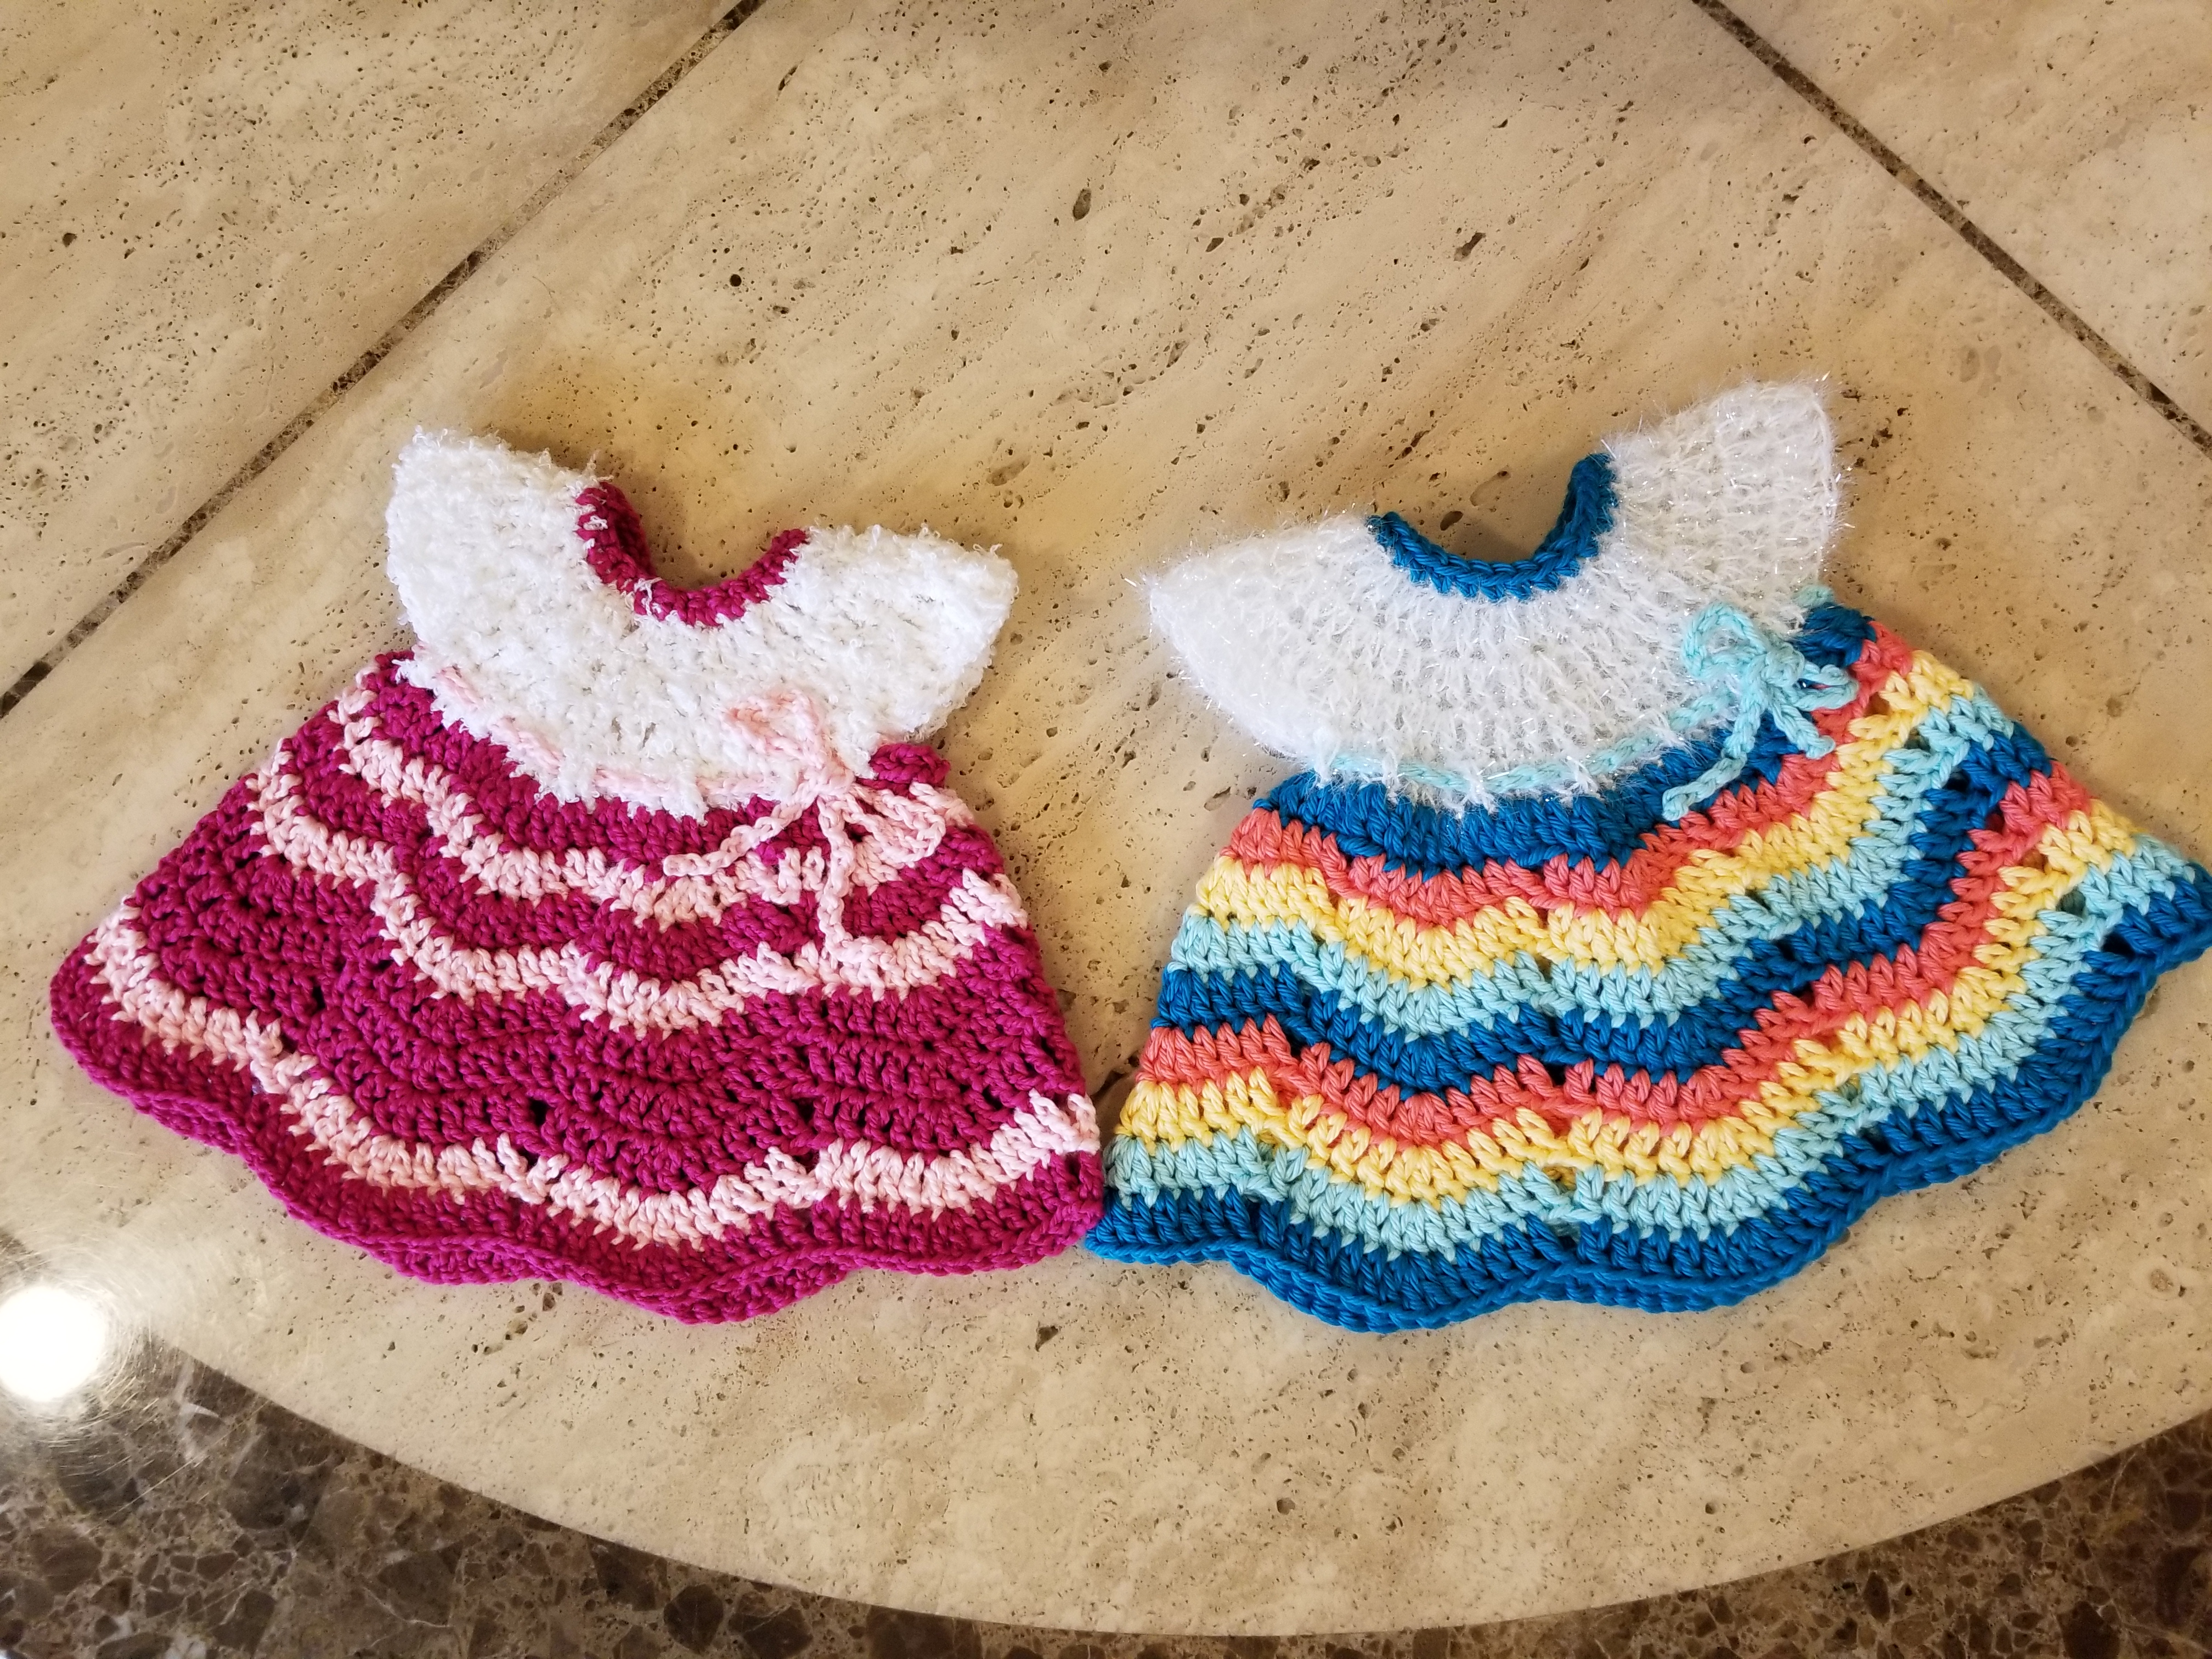 Crochet Quick Easy Beginner Fiesta Ripple Potholder Or